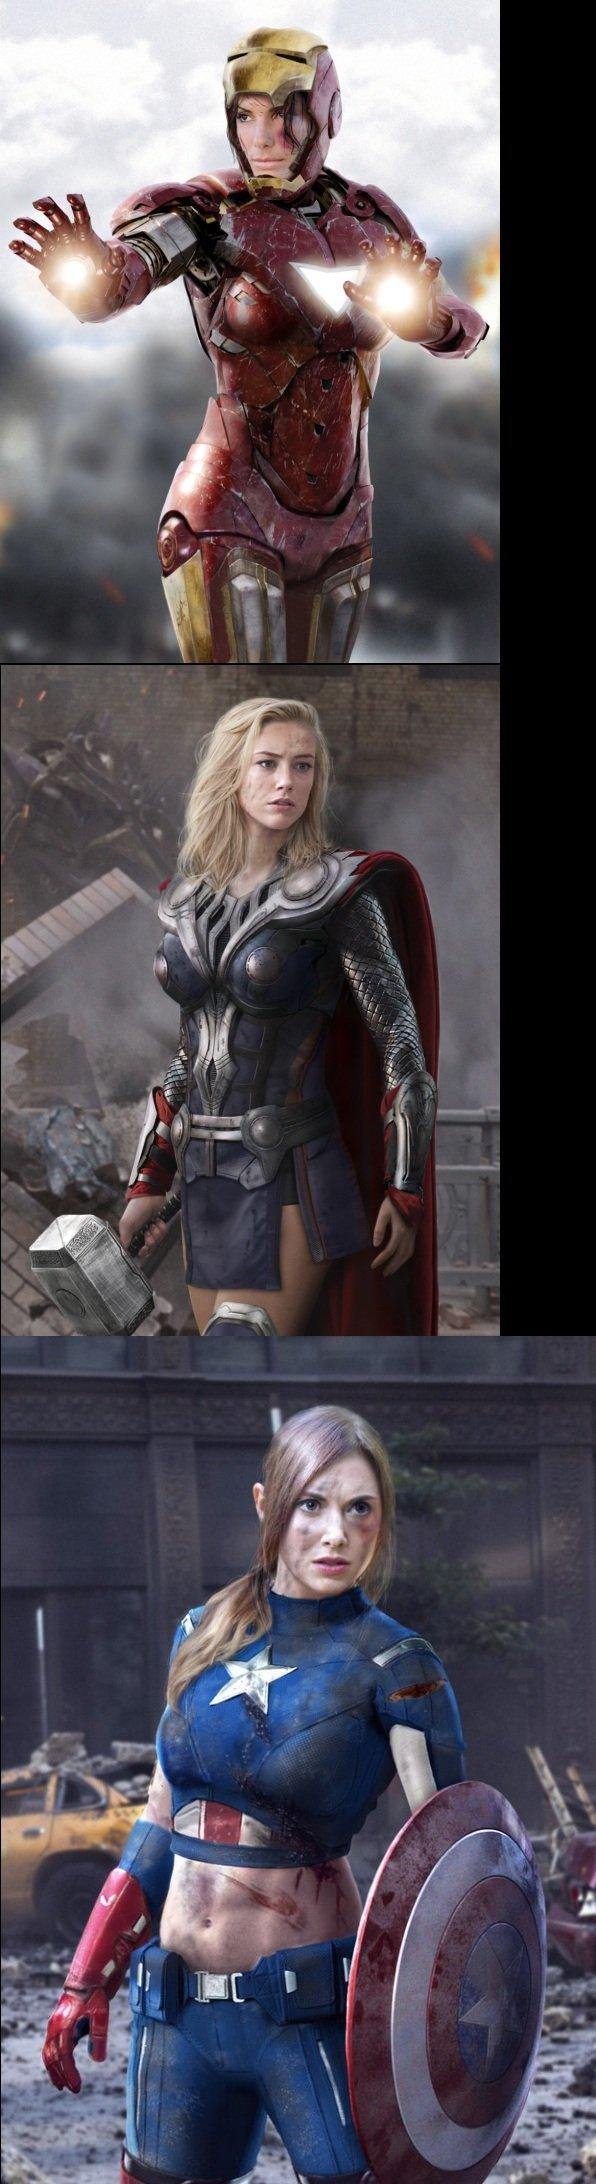 Female Avengers. Sandra Bullock as Iron Maiden Amber Heard as Thor Alison Brie as Cpt. America.. Female Nick Fury